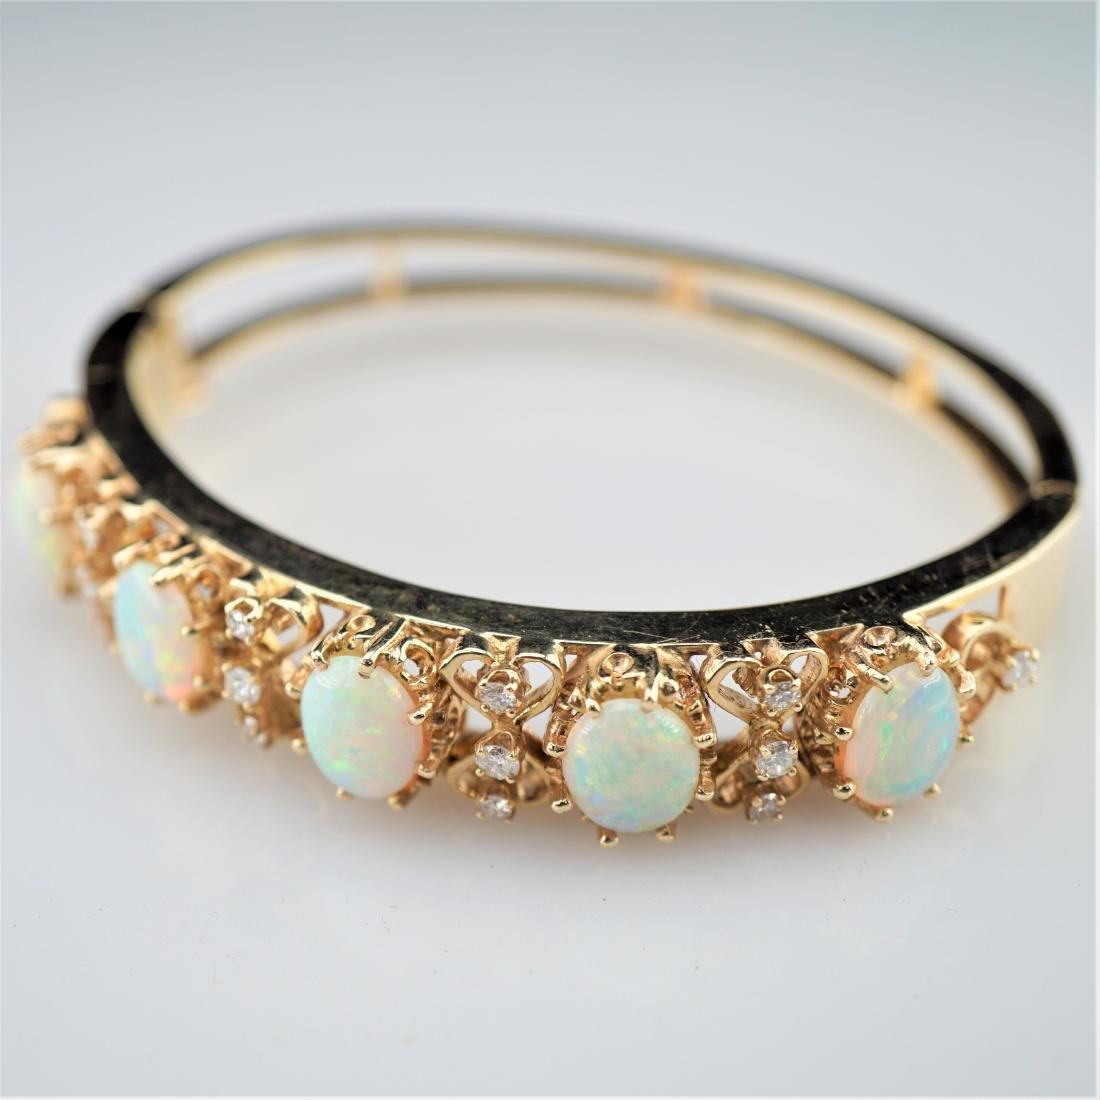 Fire Opal 14k YG Bracelet with Diamonds